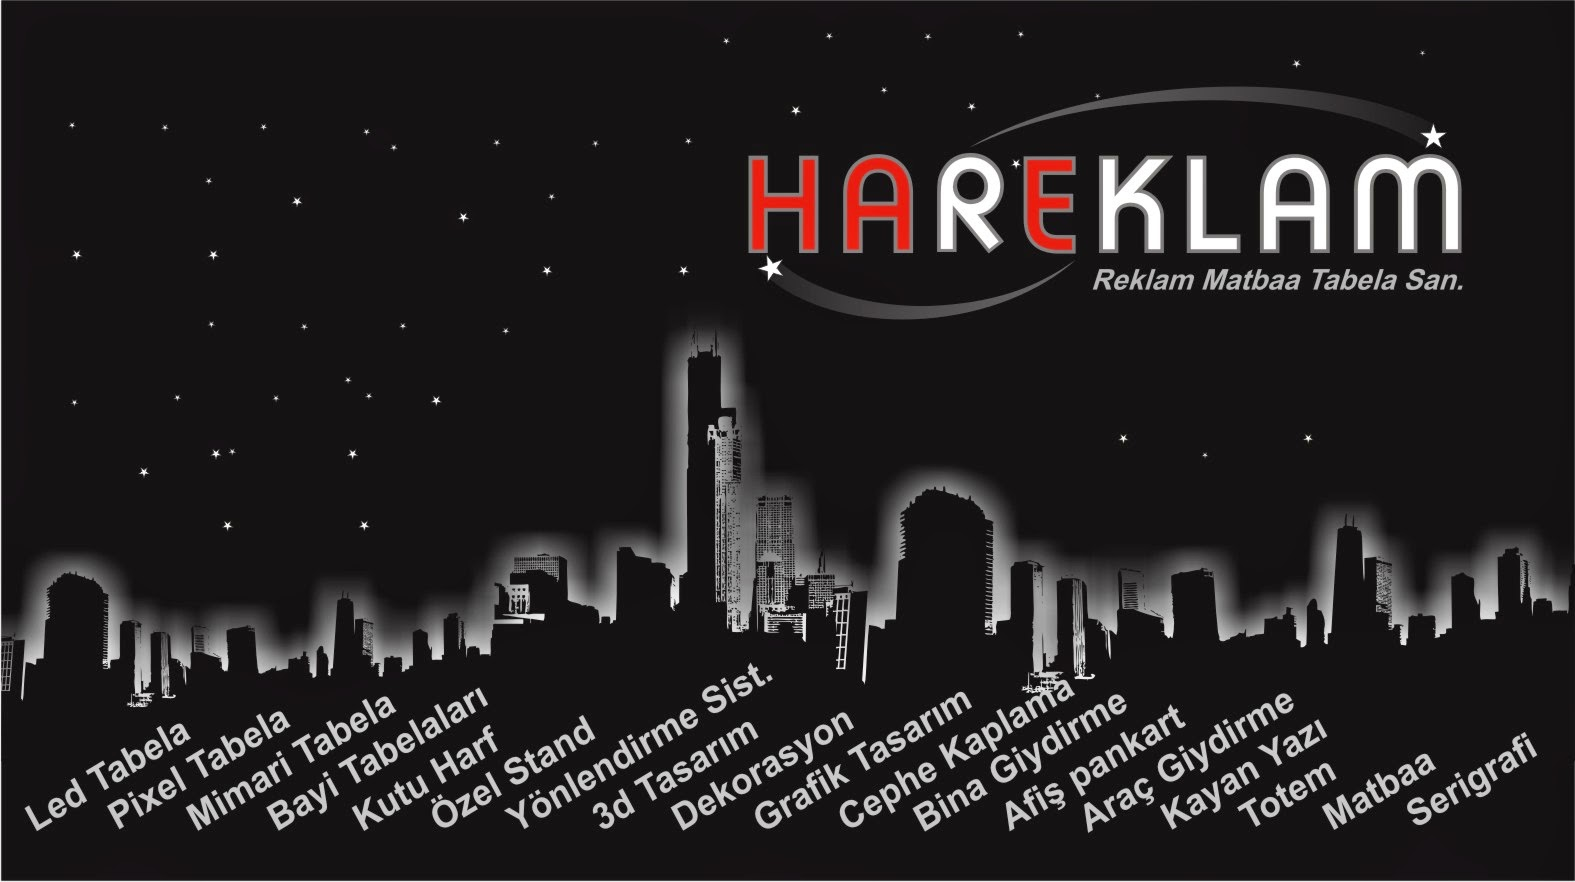 Ankarada Tabelacı / Totem Kutu Harf Tabela 0542 286 50 80